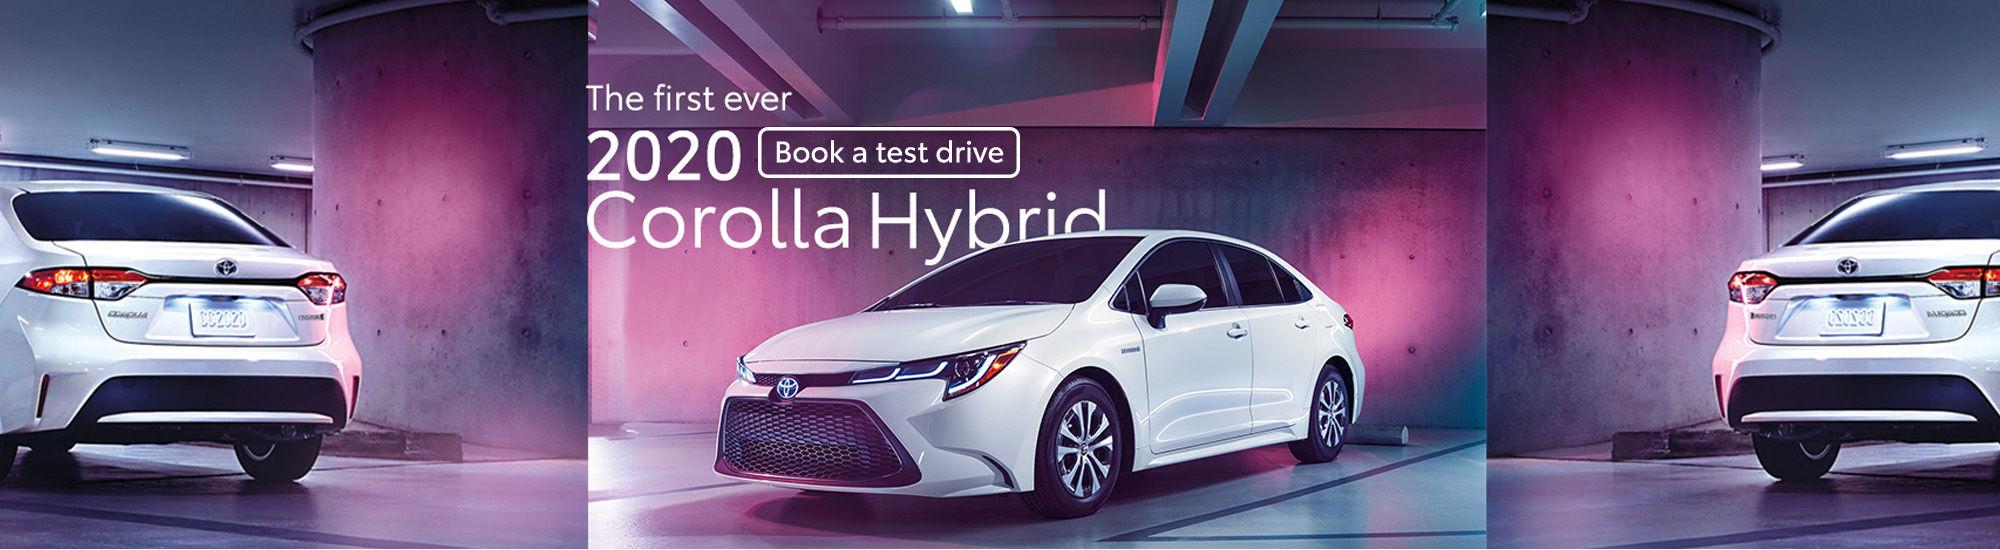 2020 Hybrid Corolla